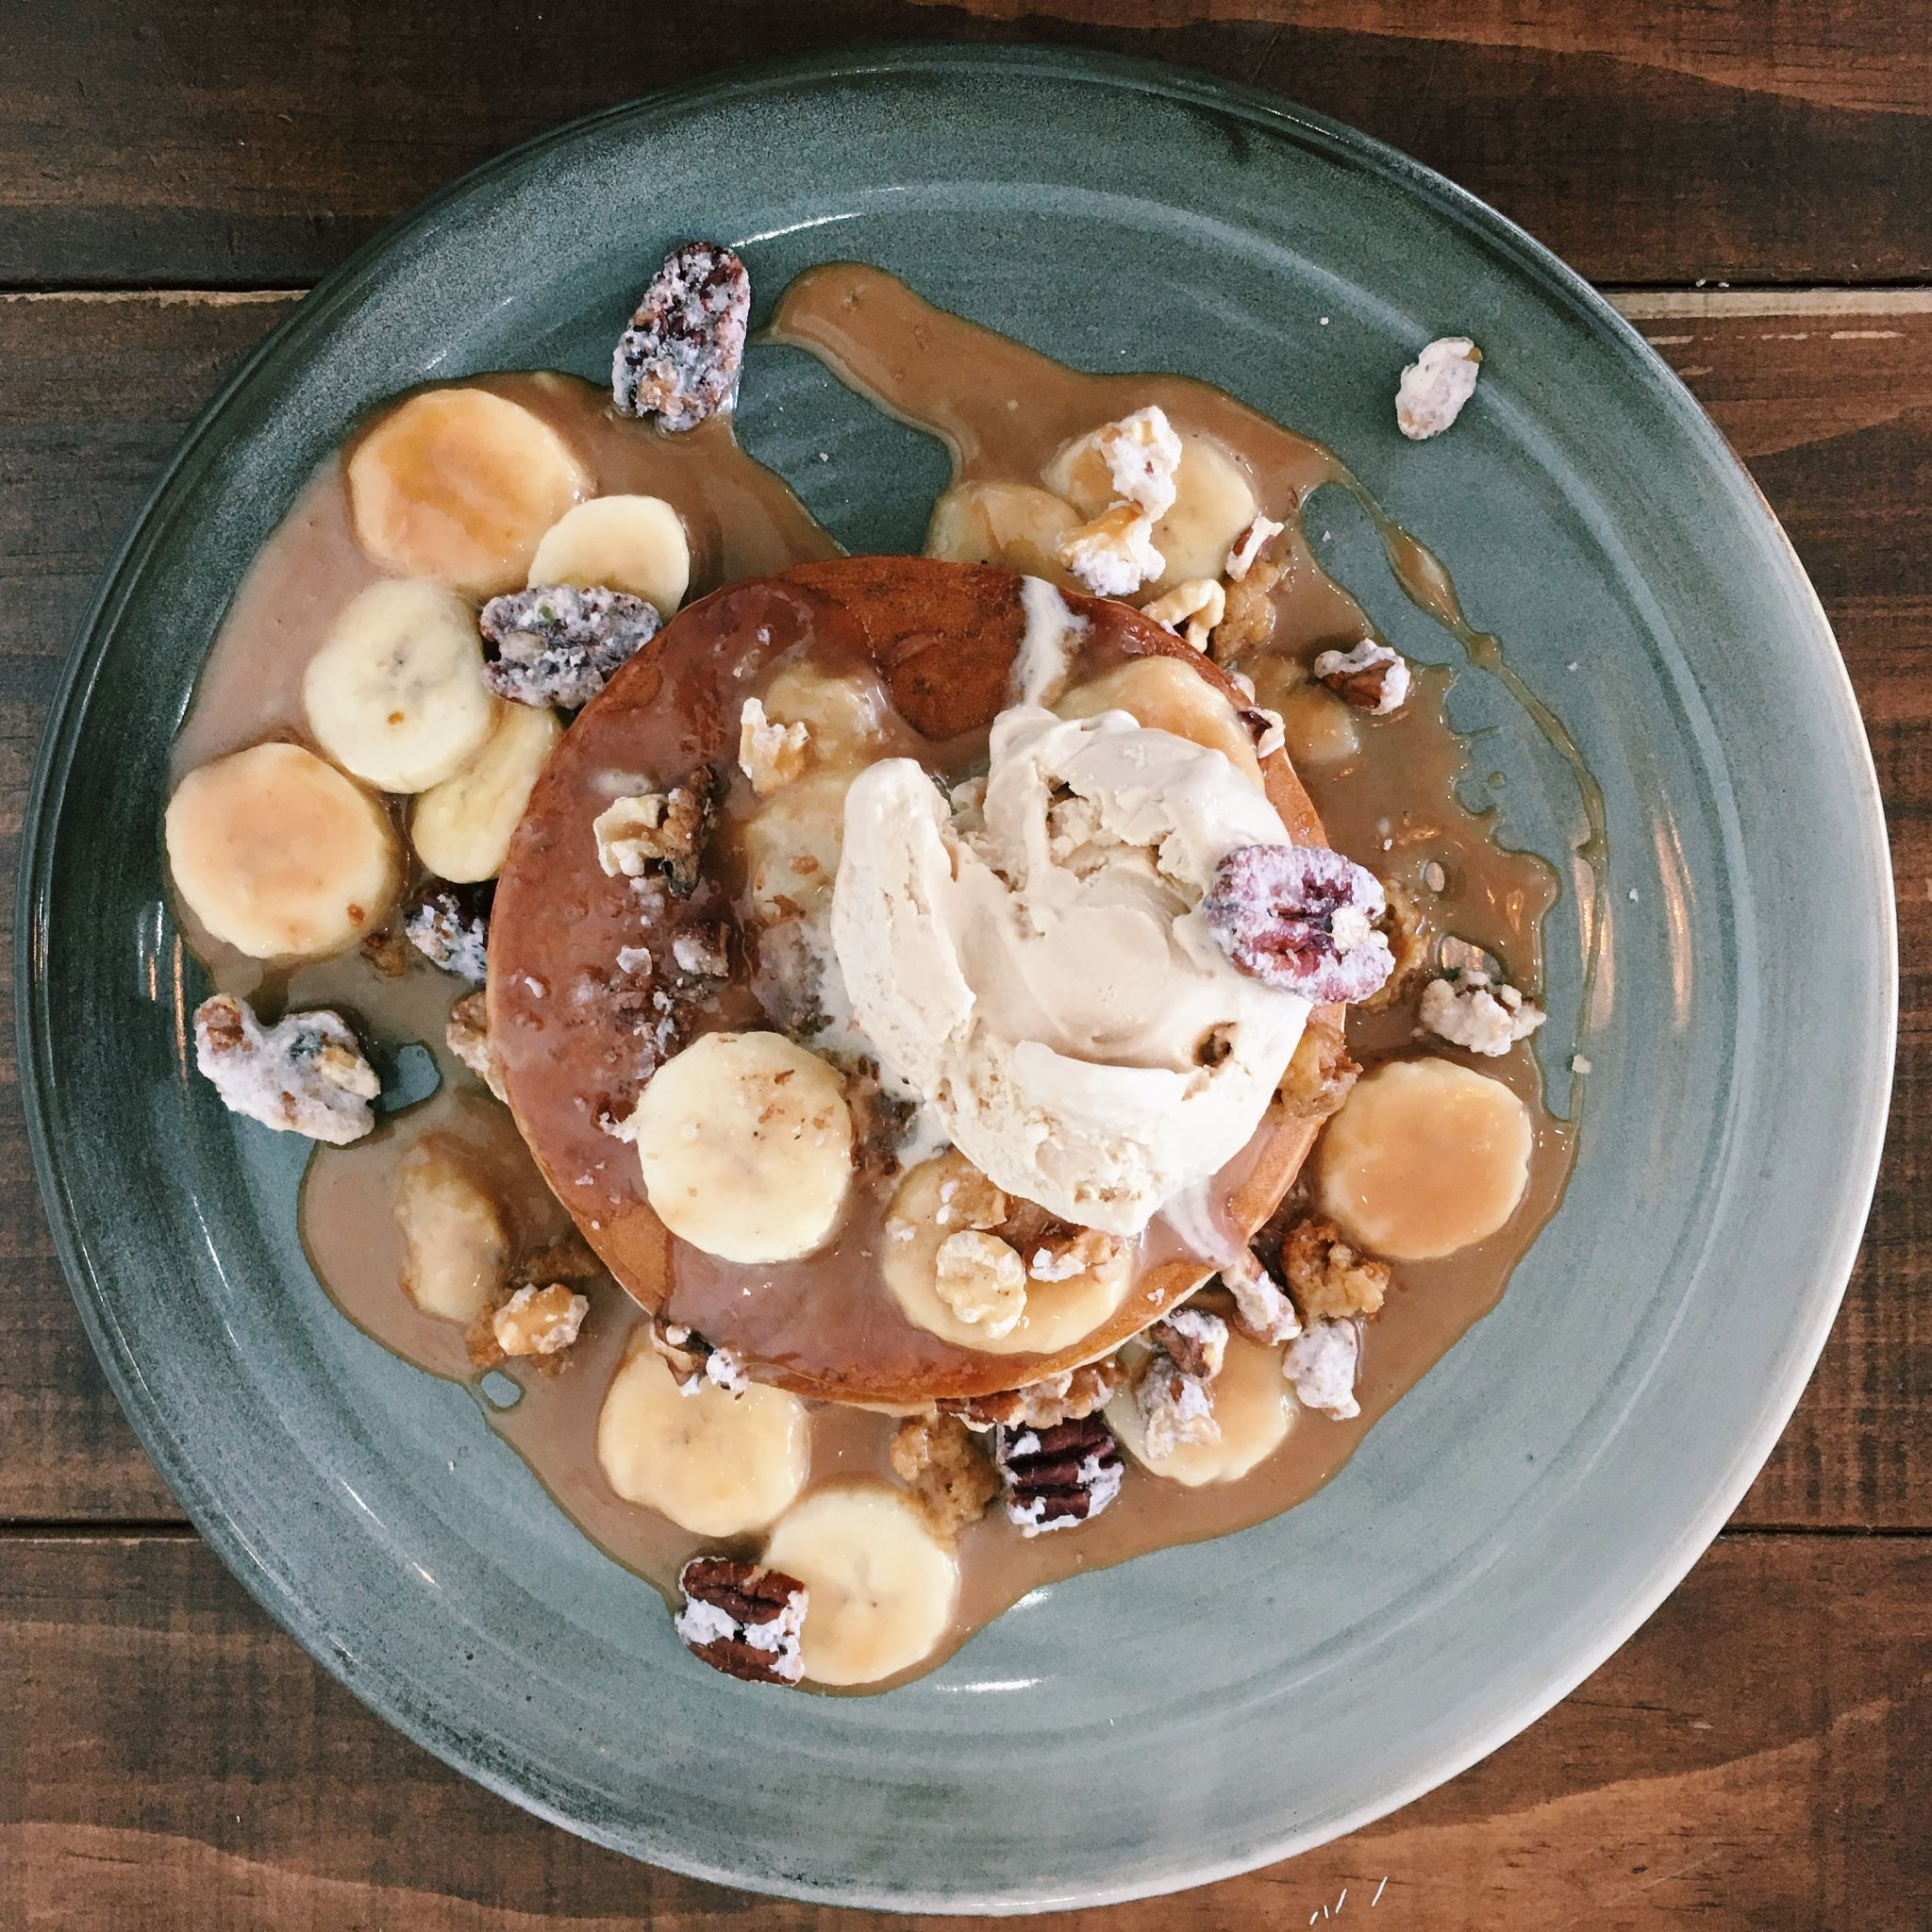 Sticky Date Pancake - Pacamara Boutique Coffee Roasters